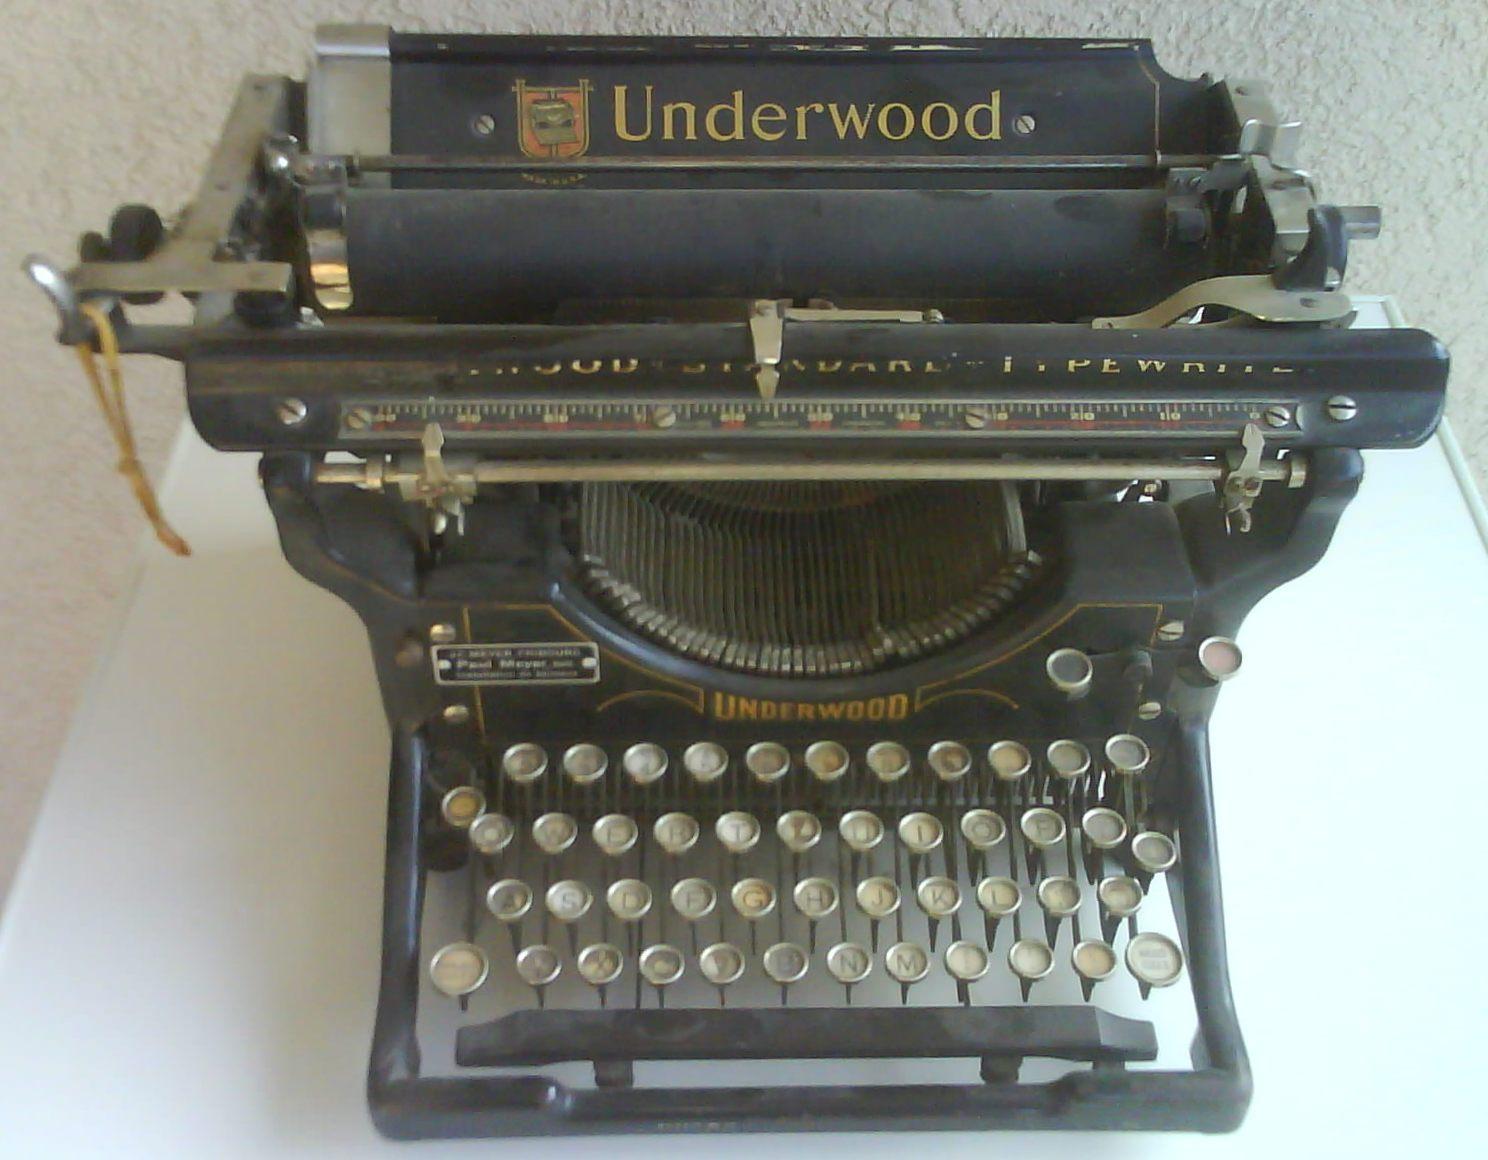 Machine crire notre histoire - Machine a ecrire underwood ...